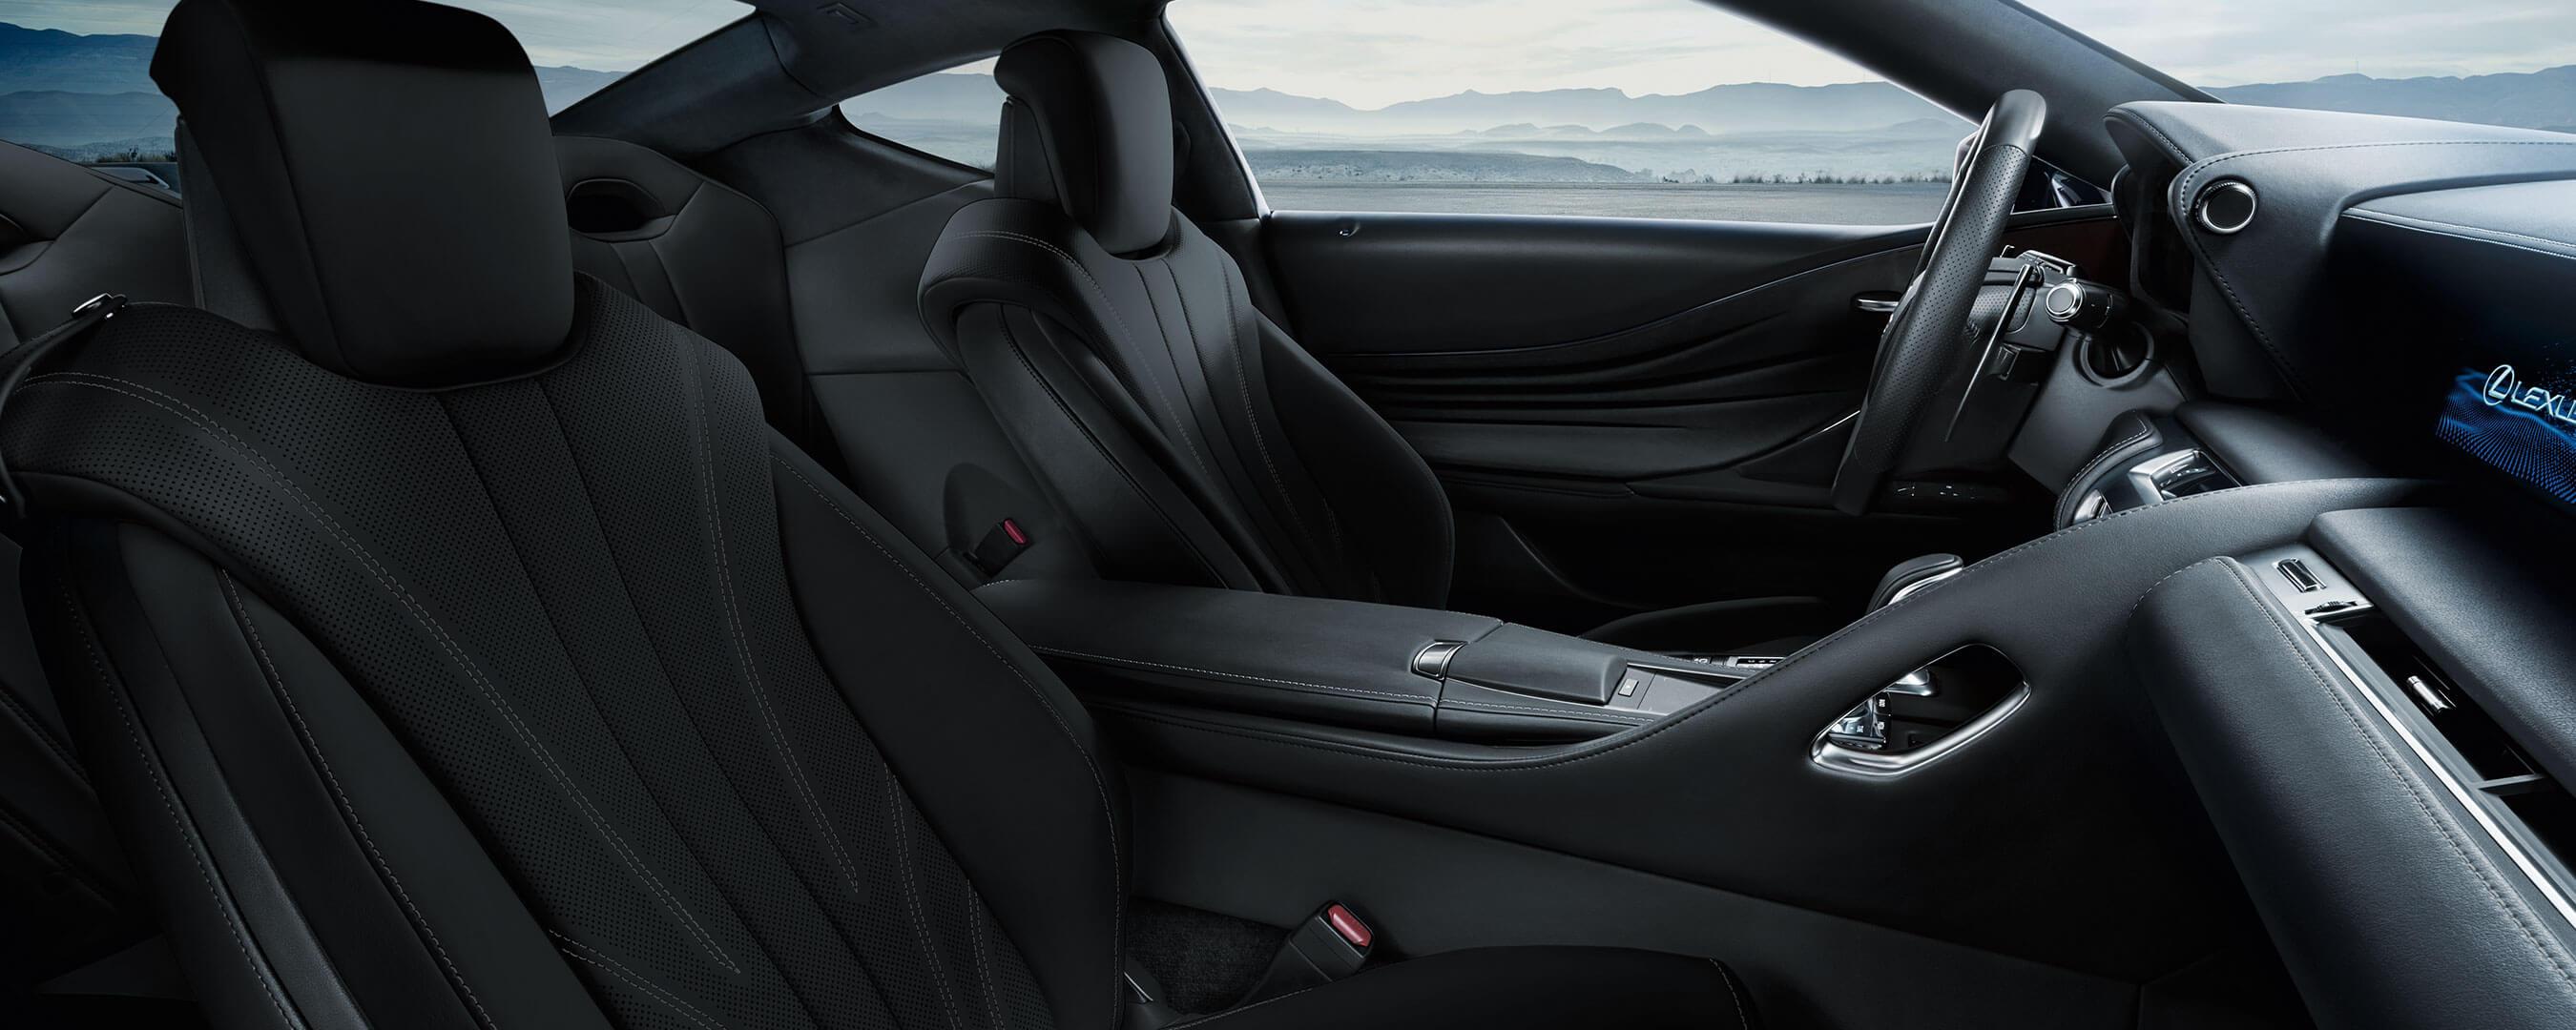 2017 lexus lc 500h experience hero opt 2 interior back